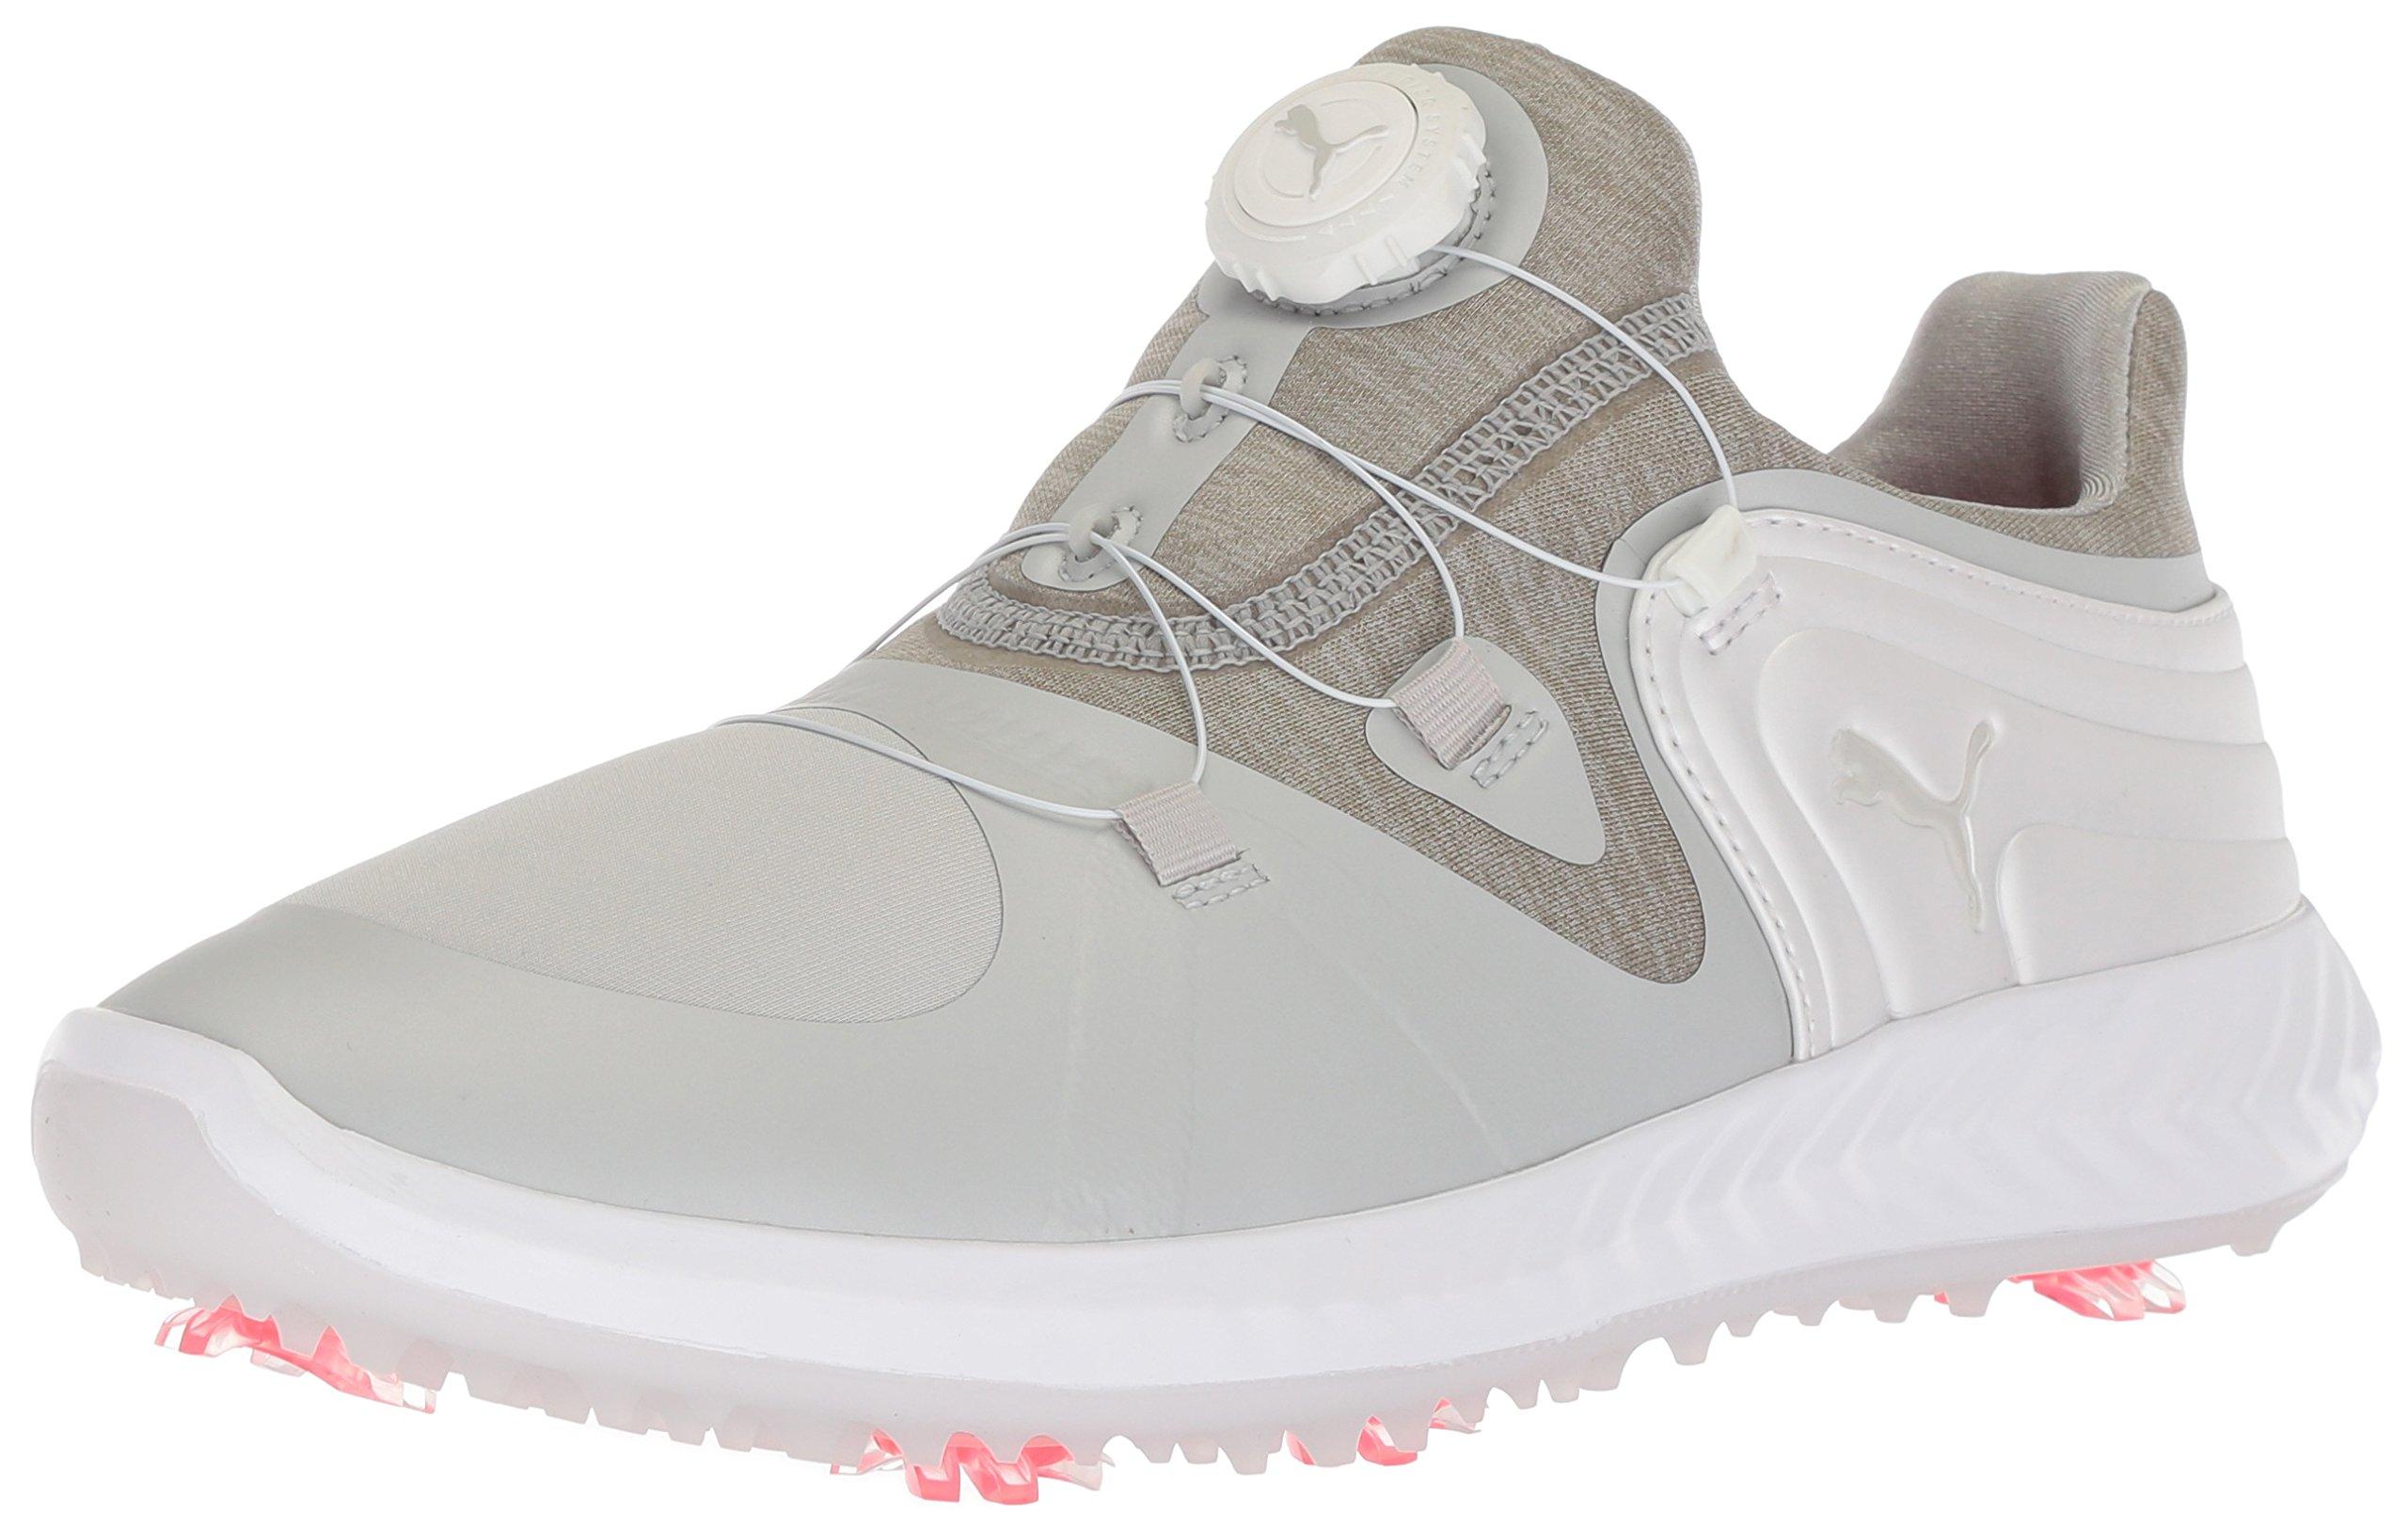 PUMA Golf Women's Ignite Blaze Sport Disc Golf Shoe, Gray Violet/White, 5.5 Medium US